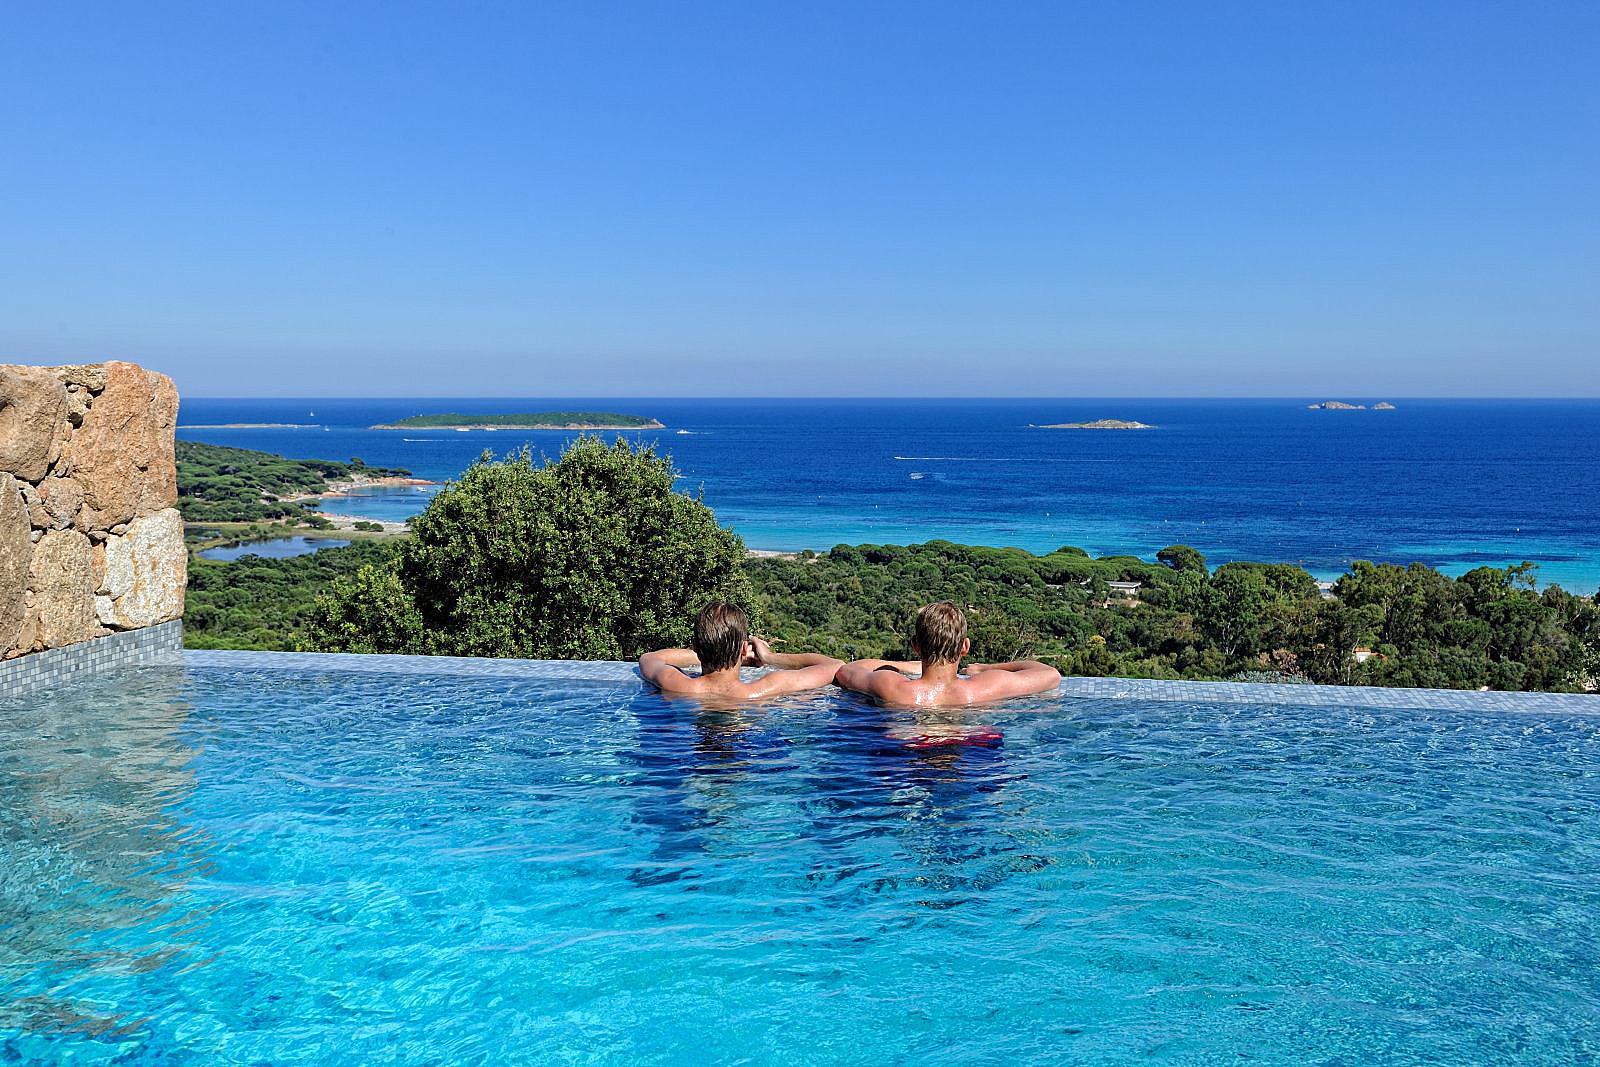 Location Vacances Villa Porto Vecchio Piscine Privee Jacuzzi Vue  Panoramique Sur La Mer En Corse ...